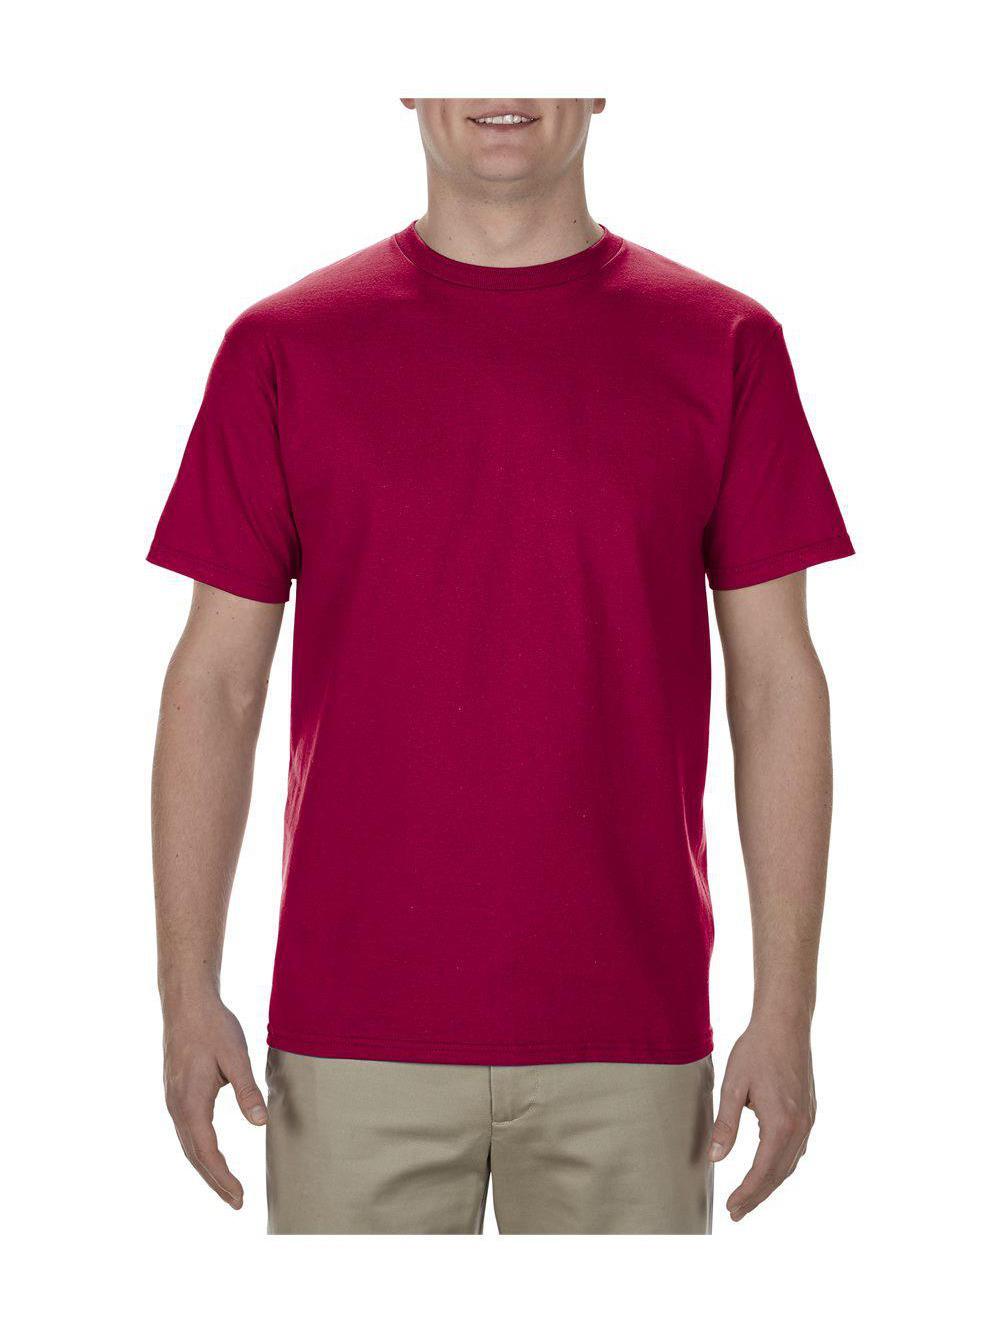 ALSTYLE-Premium-T-Shirt-1701 thumbnail 18